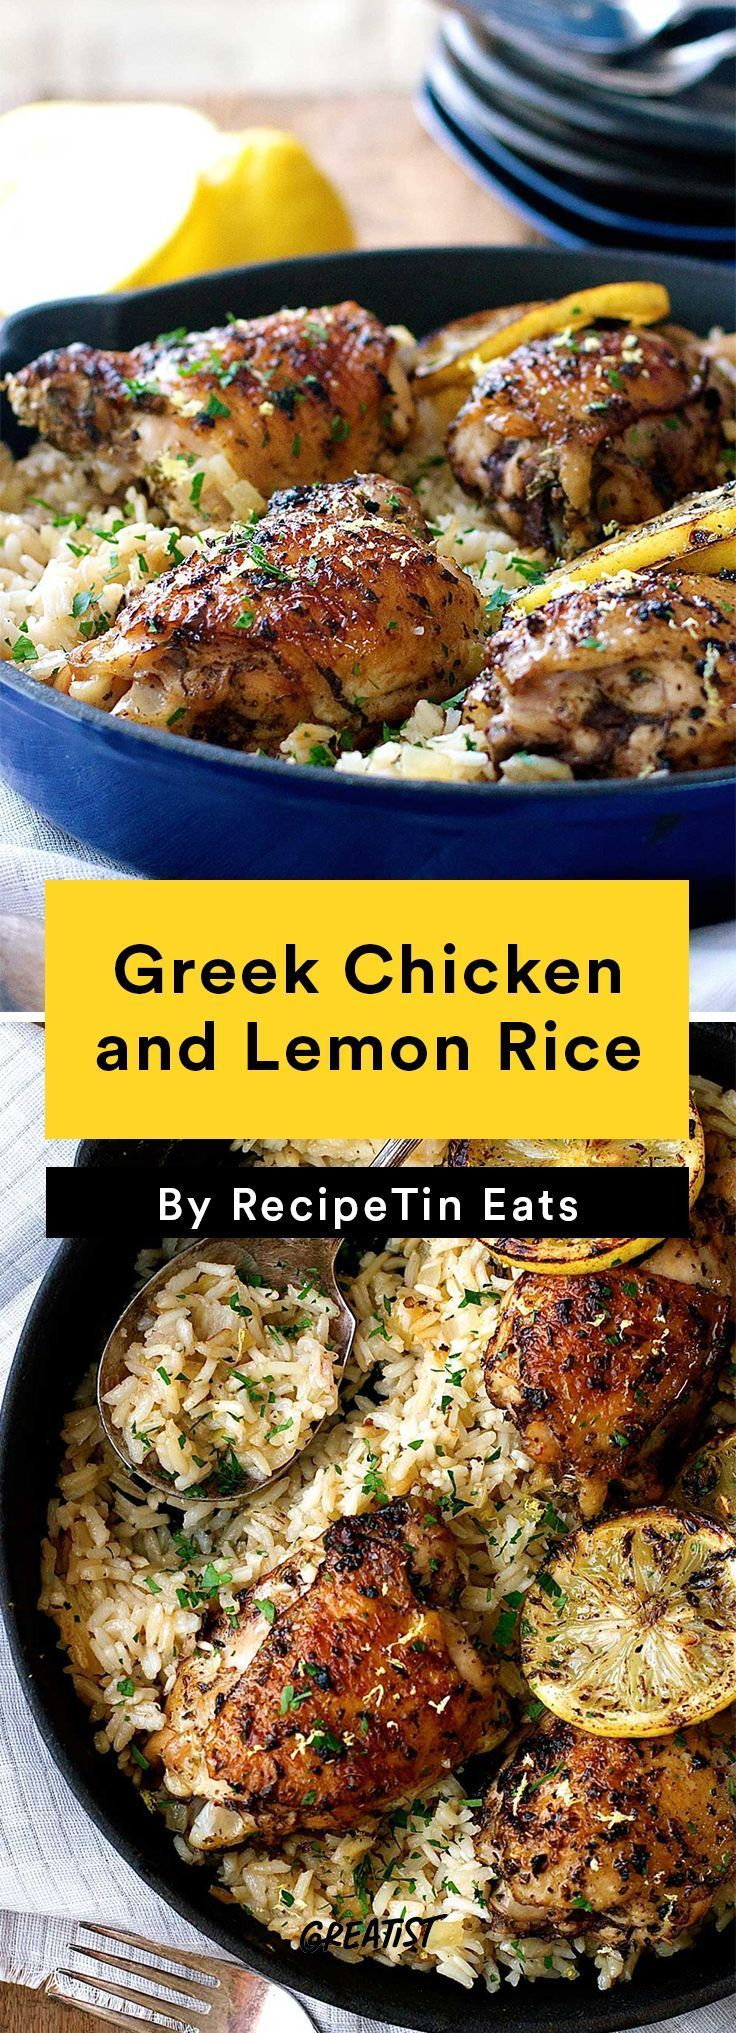 1. Greek Chicken and Lemon Rice #Greatist http://greatist.com/eat/chicken-thigh-recipes